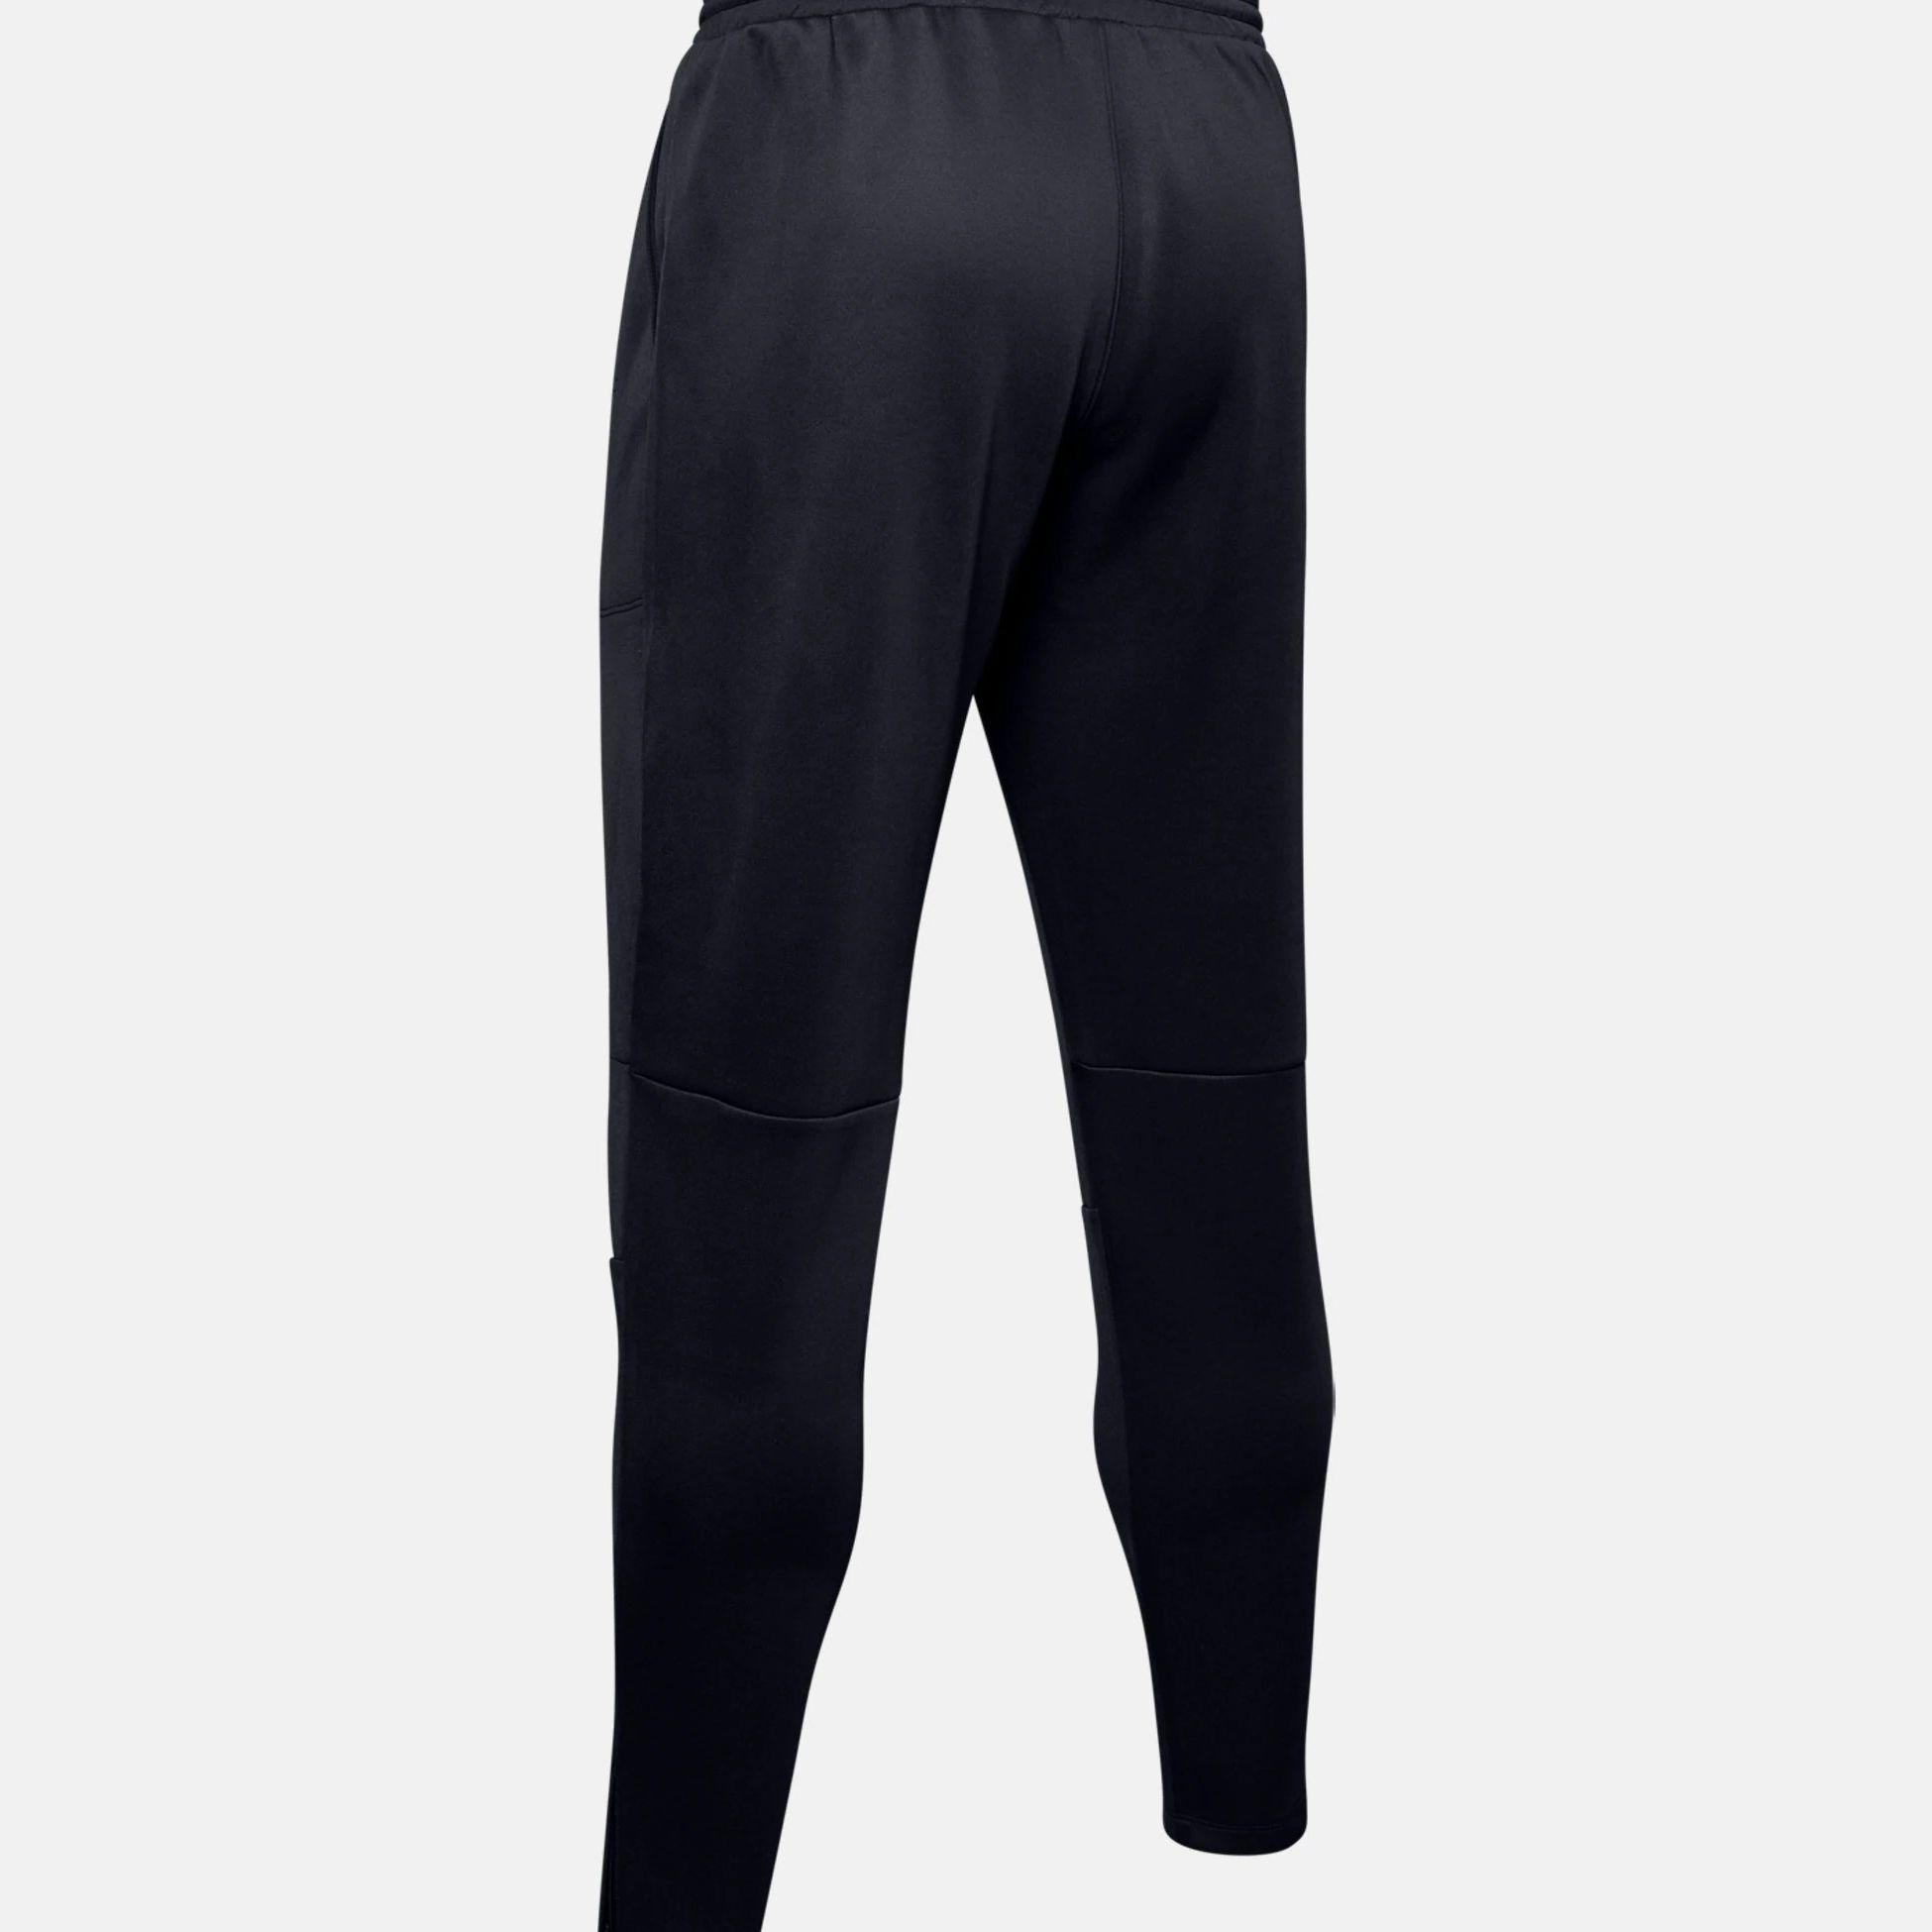 Îmbrăcăminte -  under armour UA MK-1 Warm-Up Pants 5280